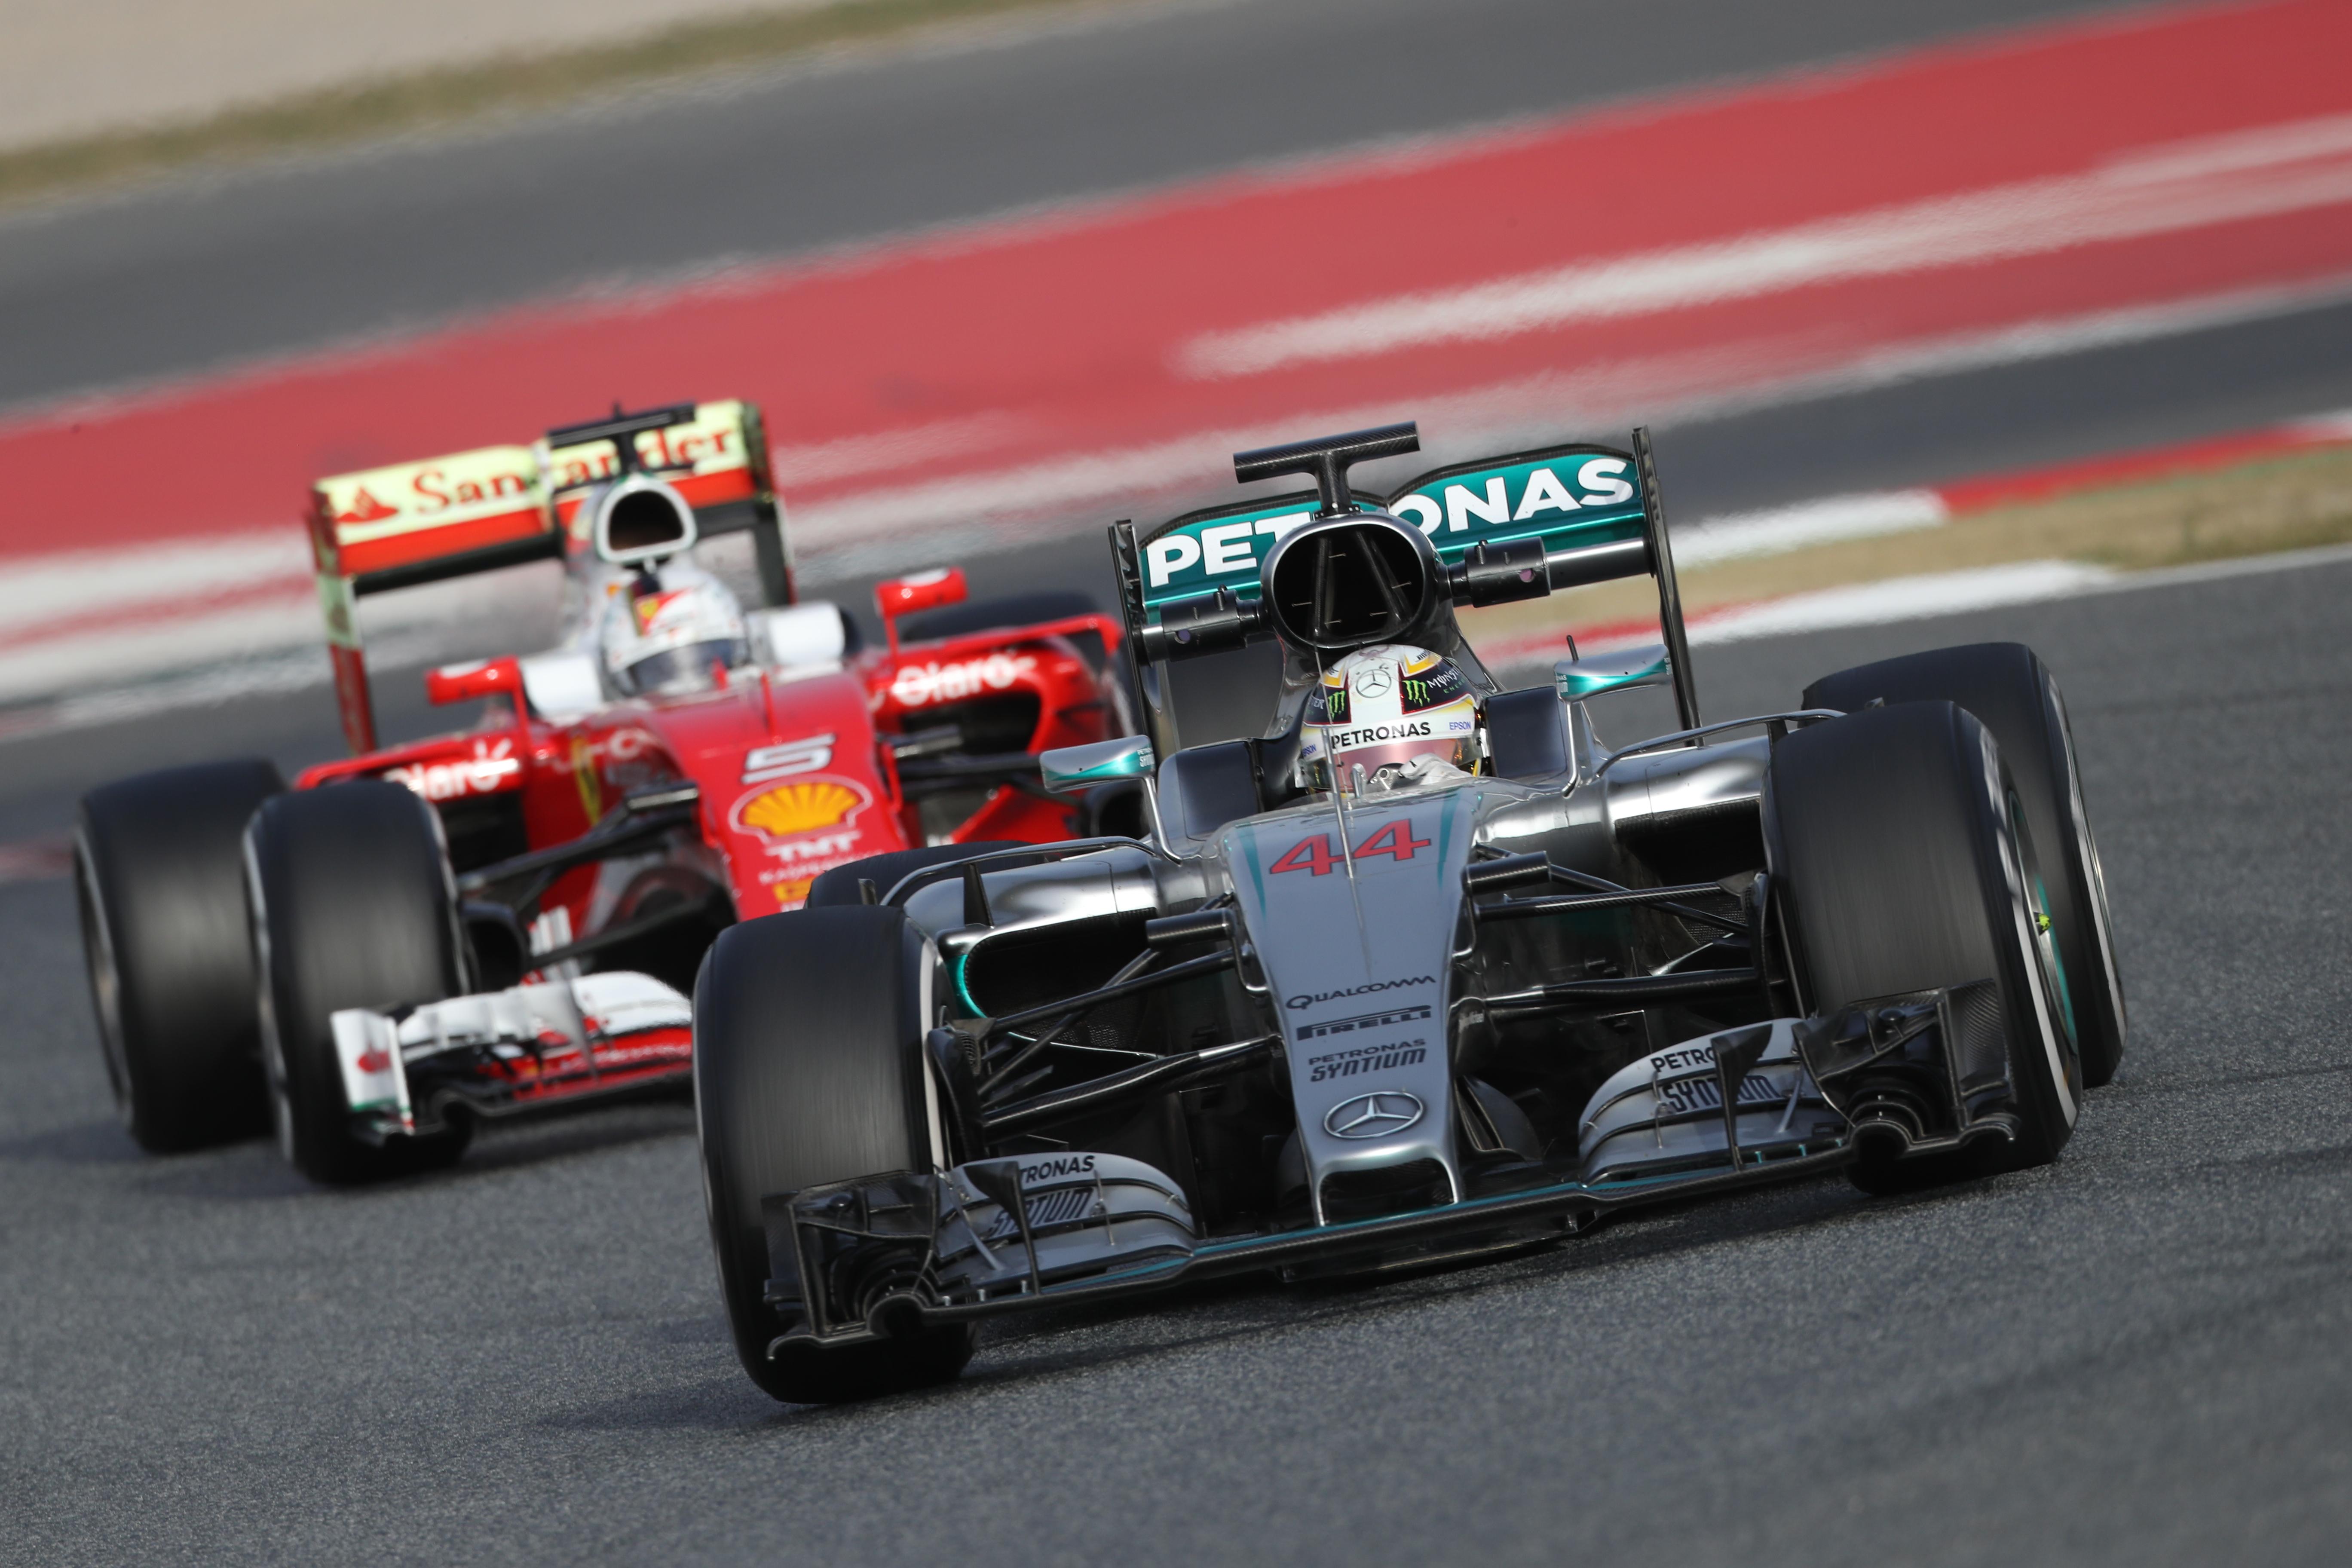 Hamilton & Vettel 2016 F1 cars